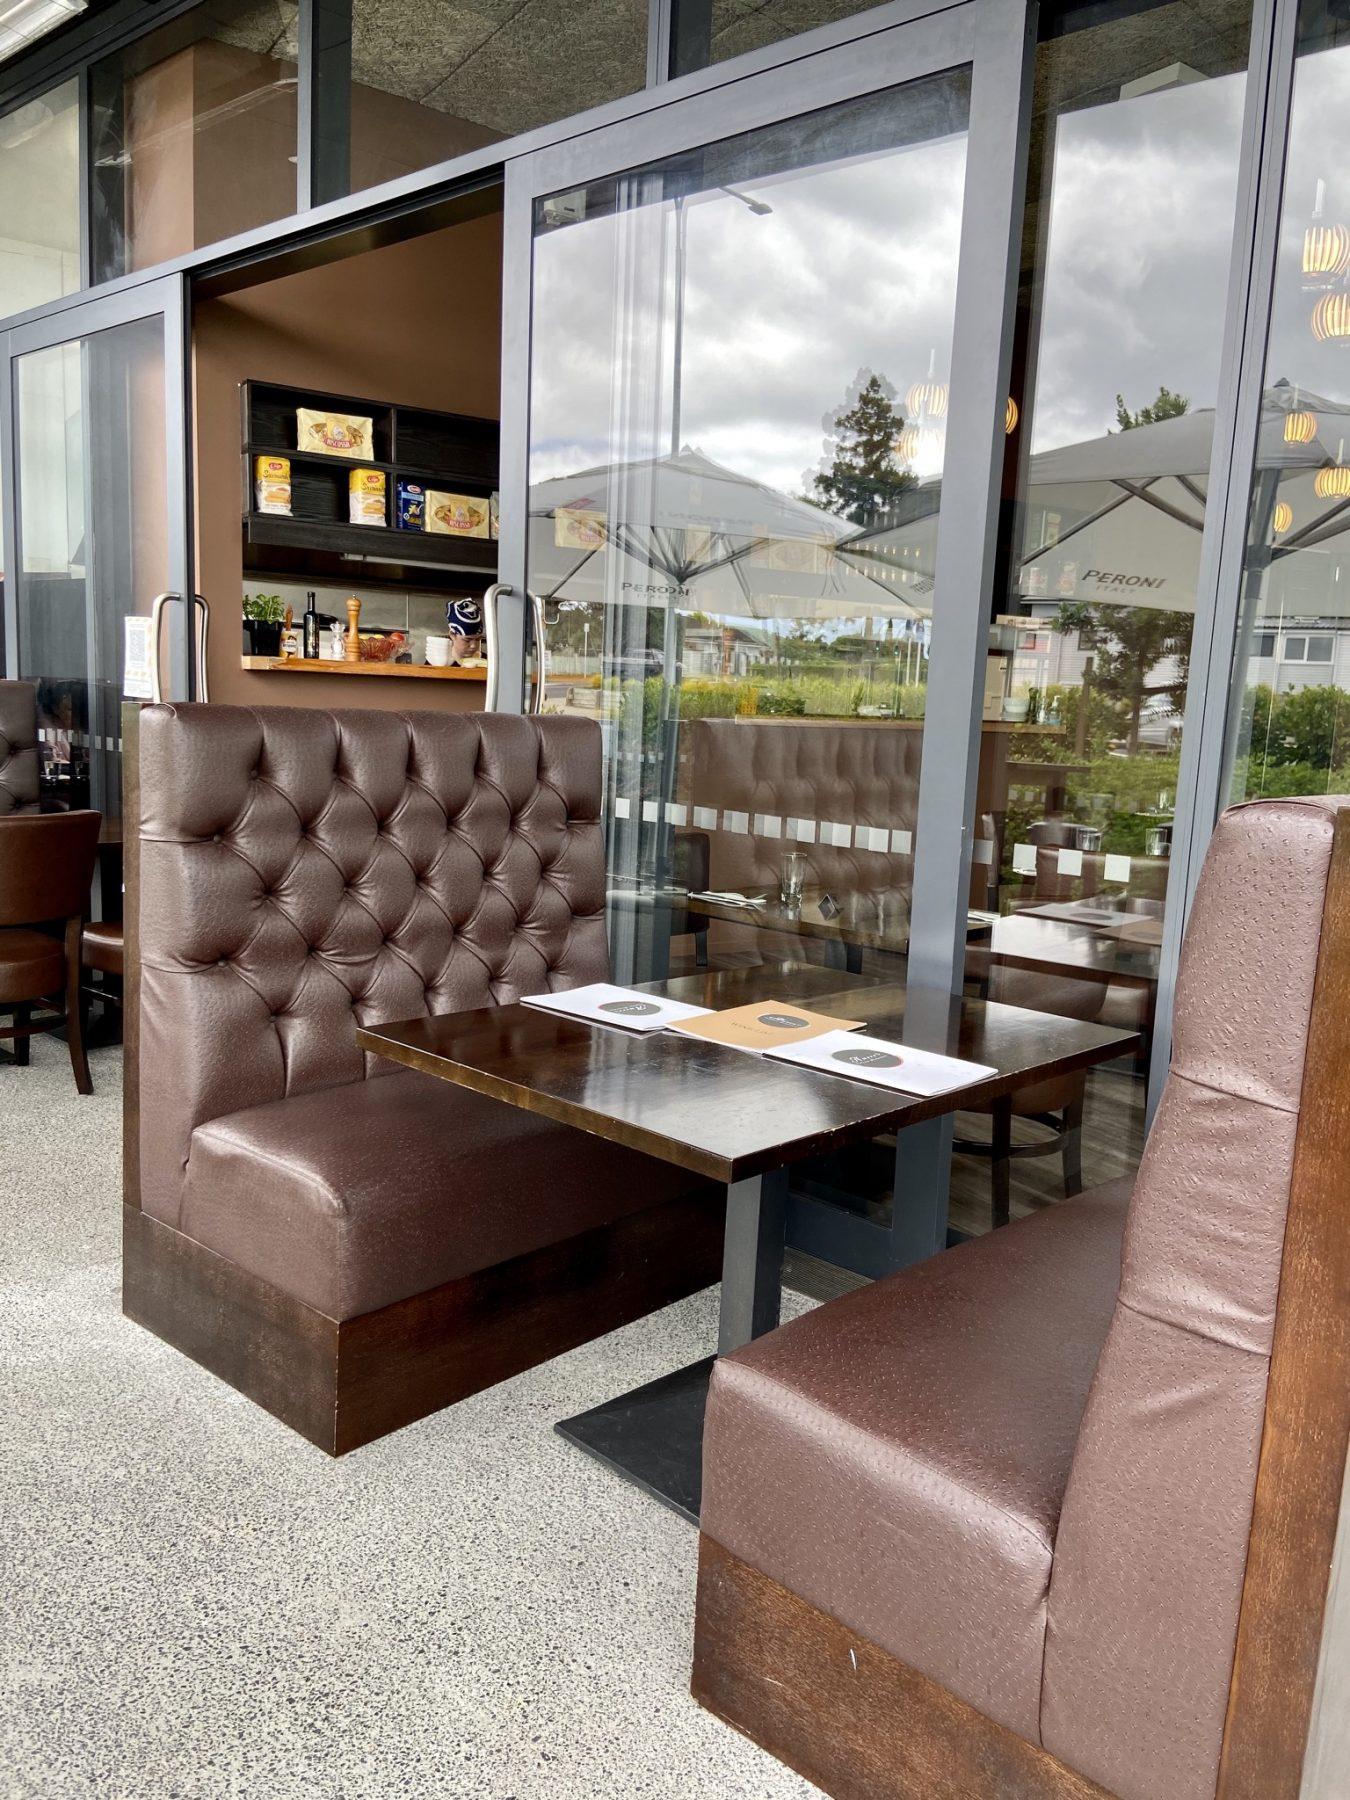 Seating at Amore Italian Restaurant Hobsonville